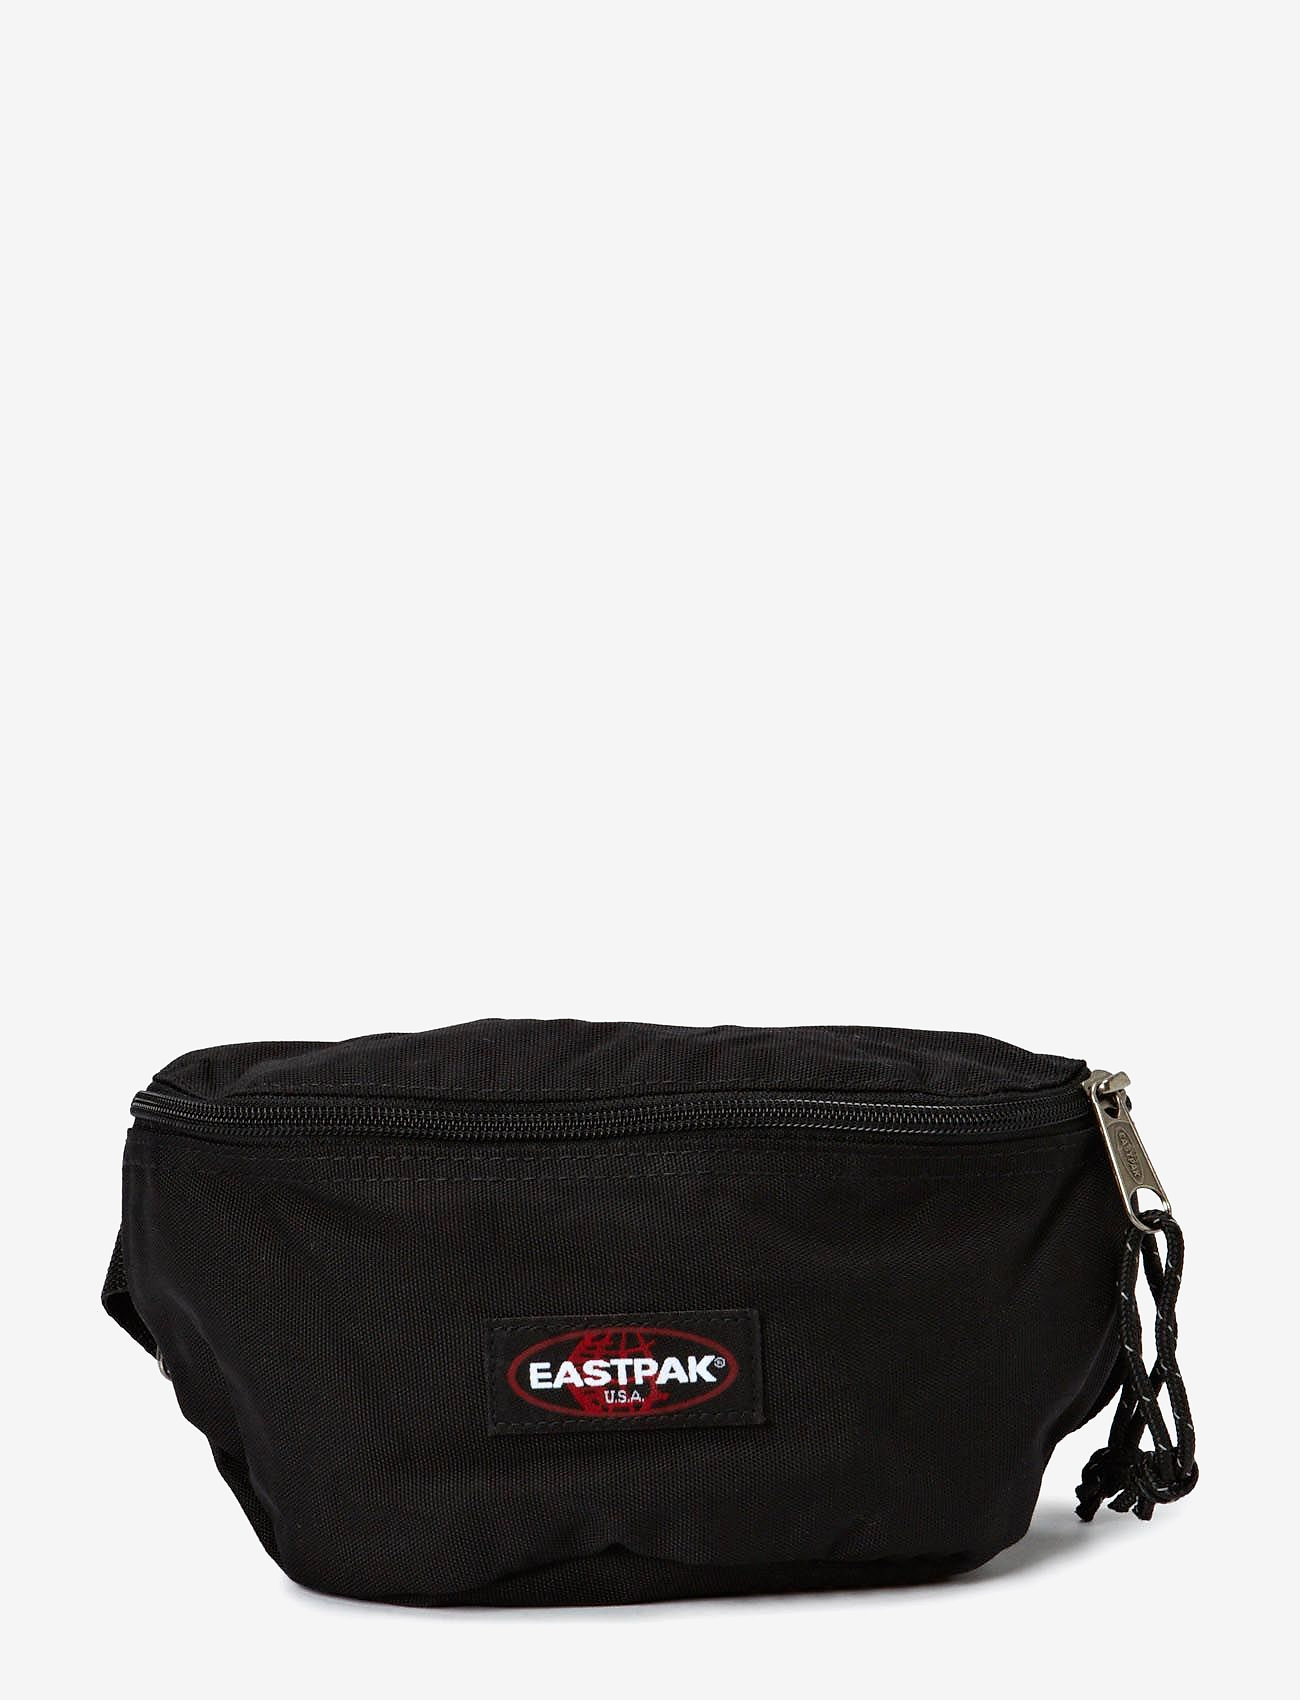 Eastpak - SPRINGER - bum bags - black - 0